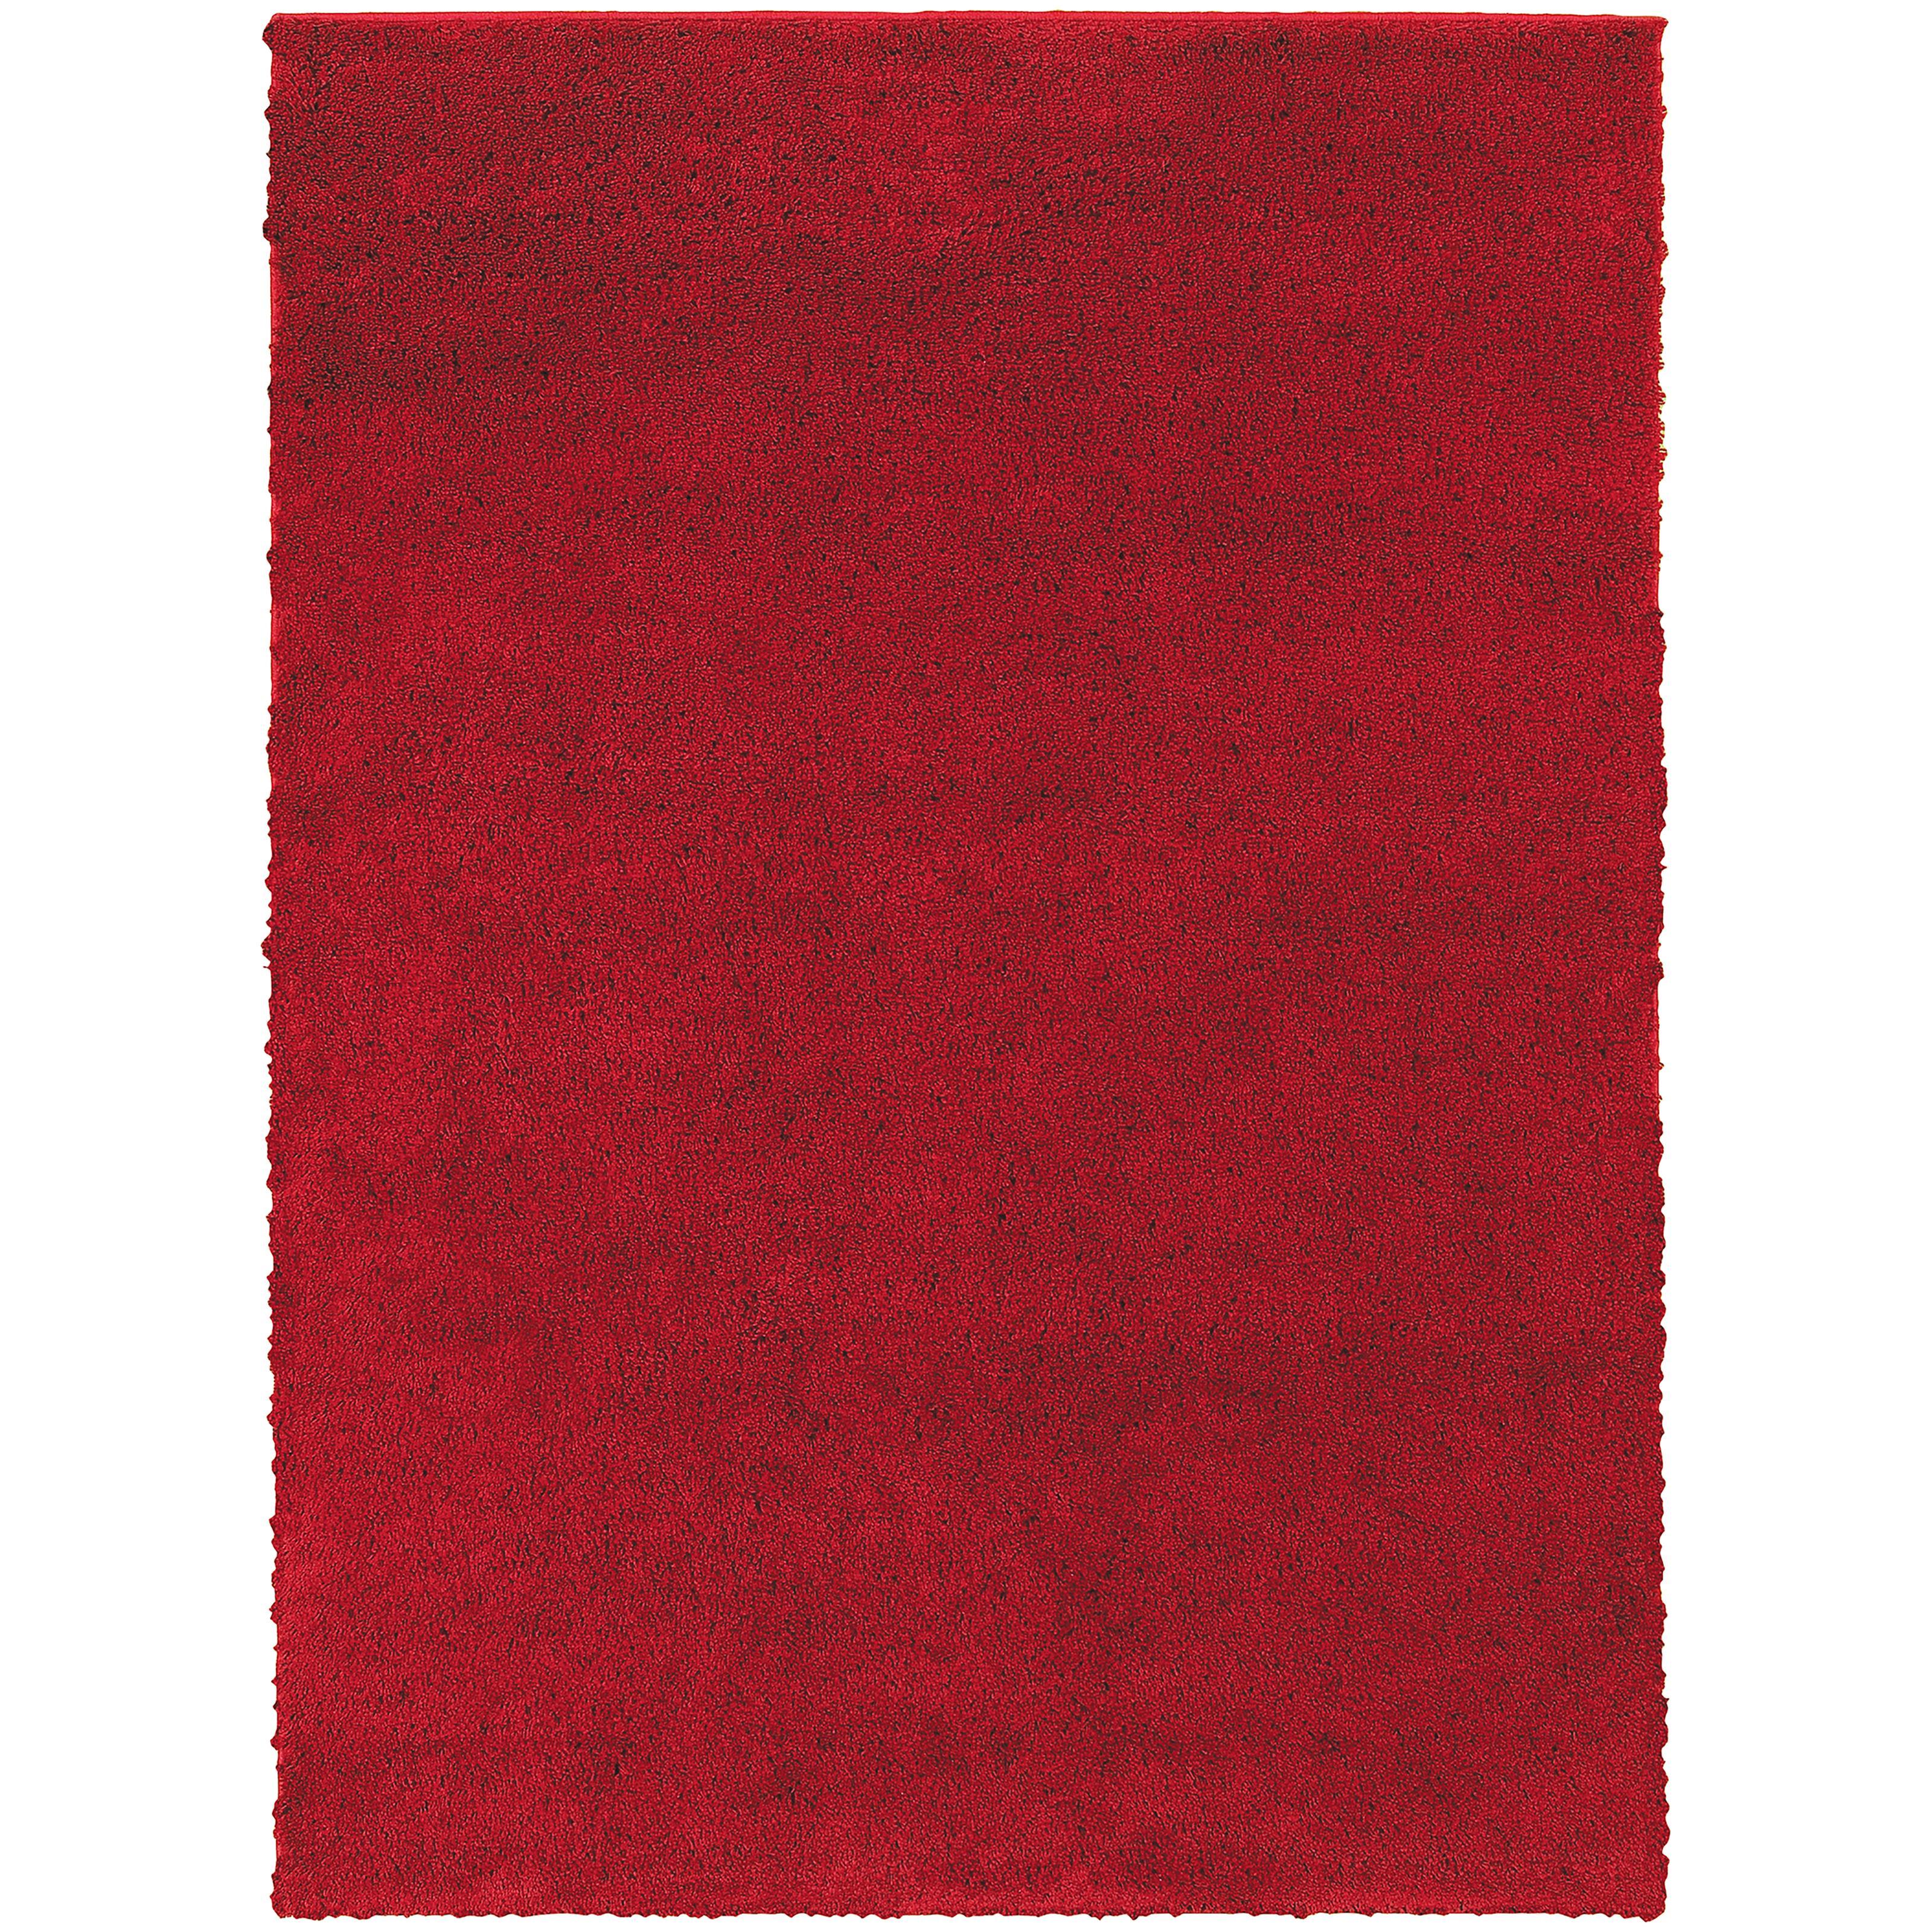 "Oriental Weavers Impressions 5' 3"" X  7' 3"" Rug - Item Number: I84600160220ST"